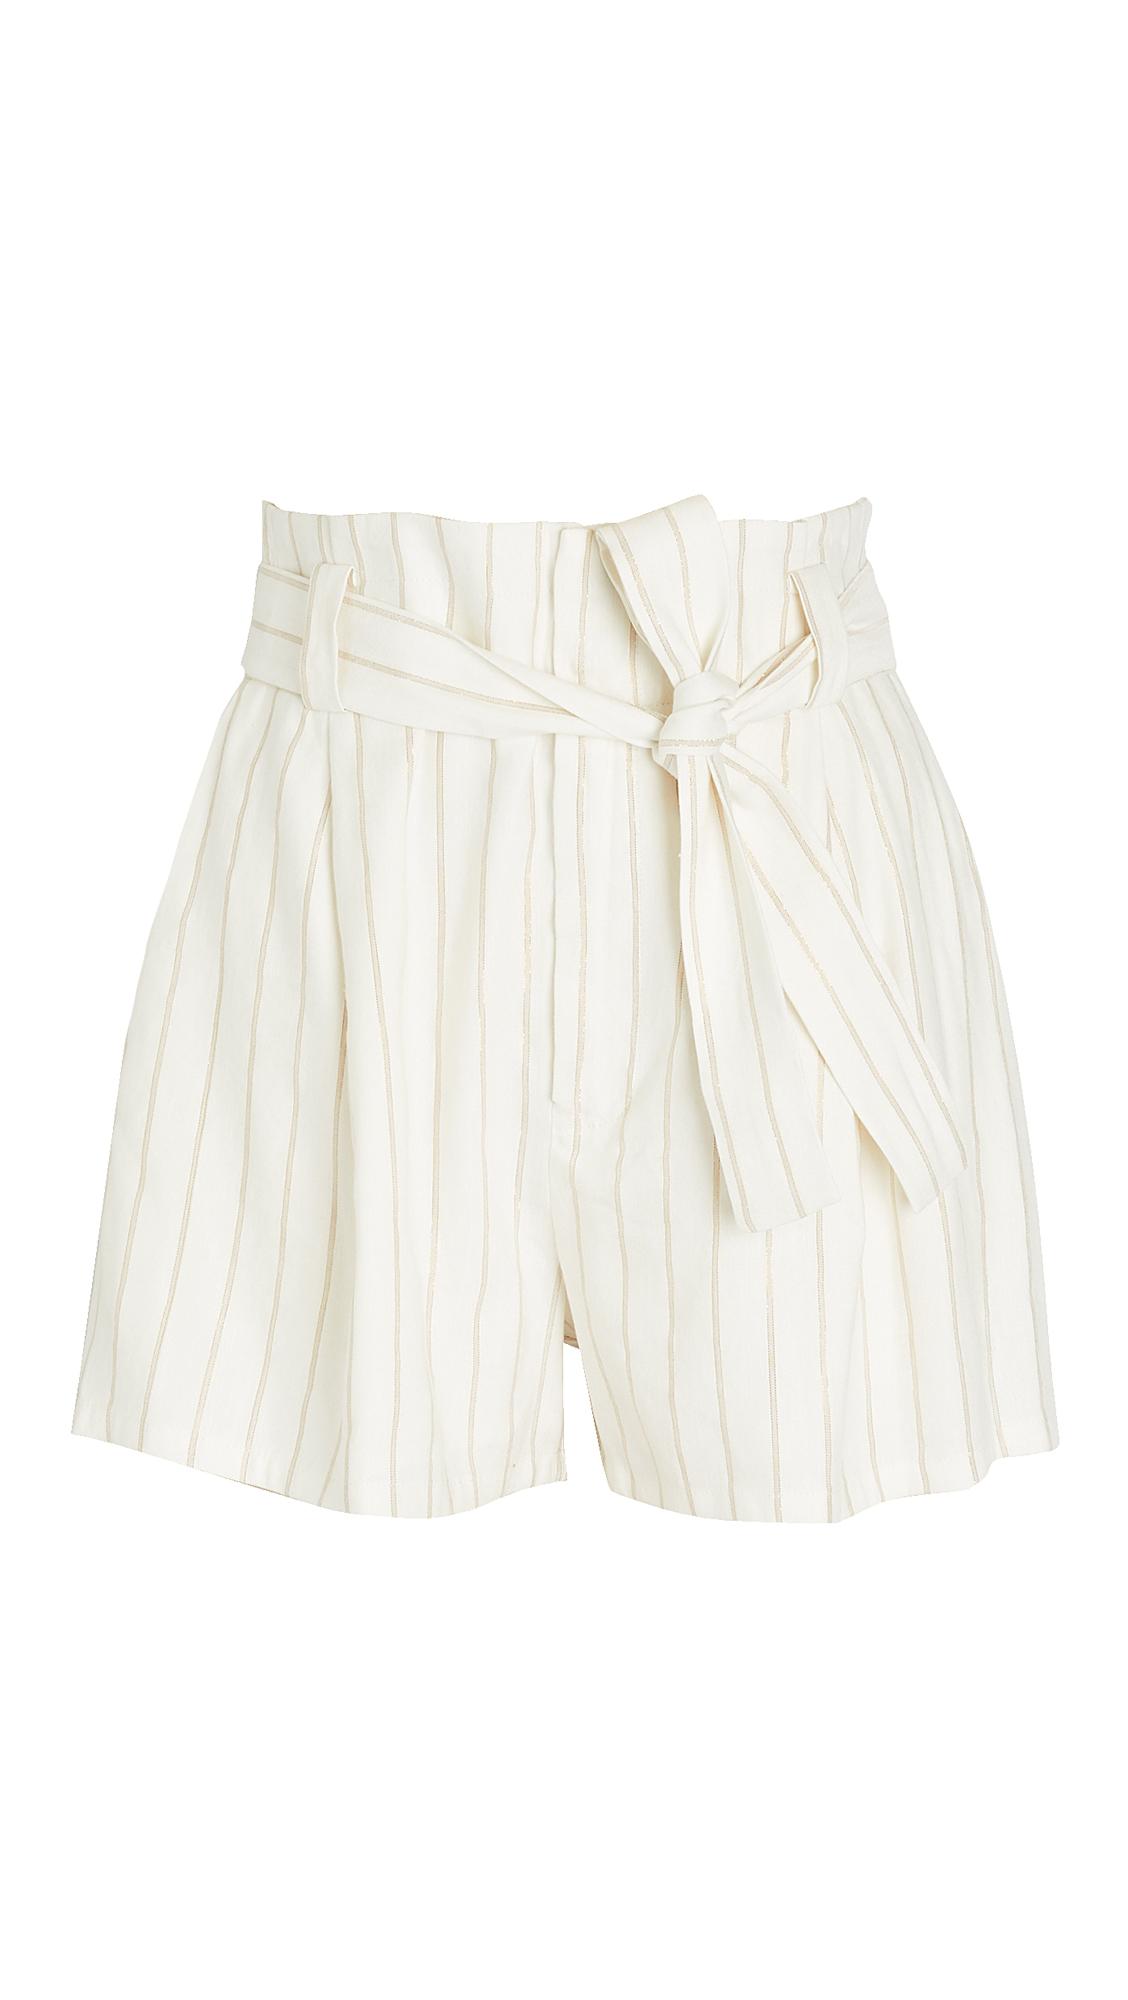 PAIGE Siesta Shorts